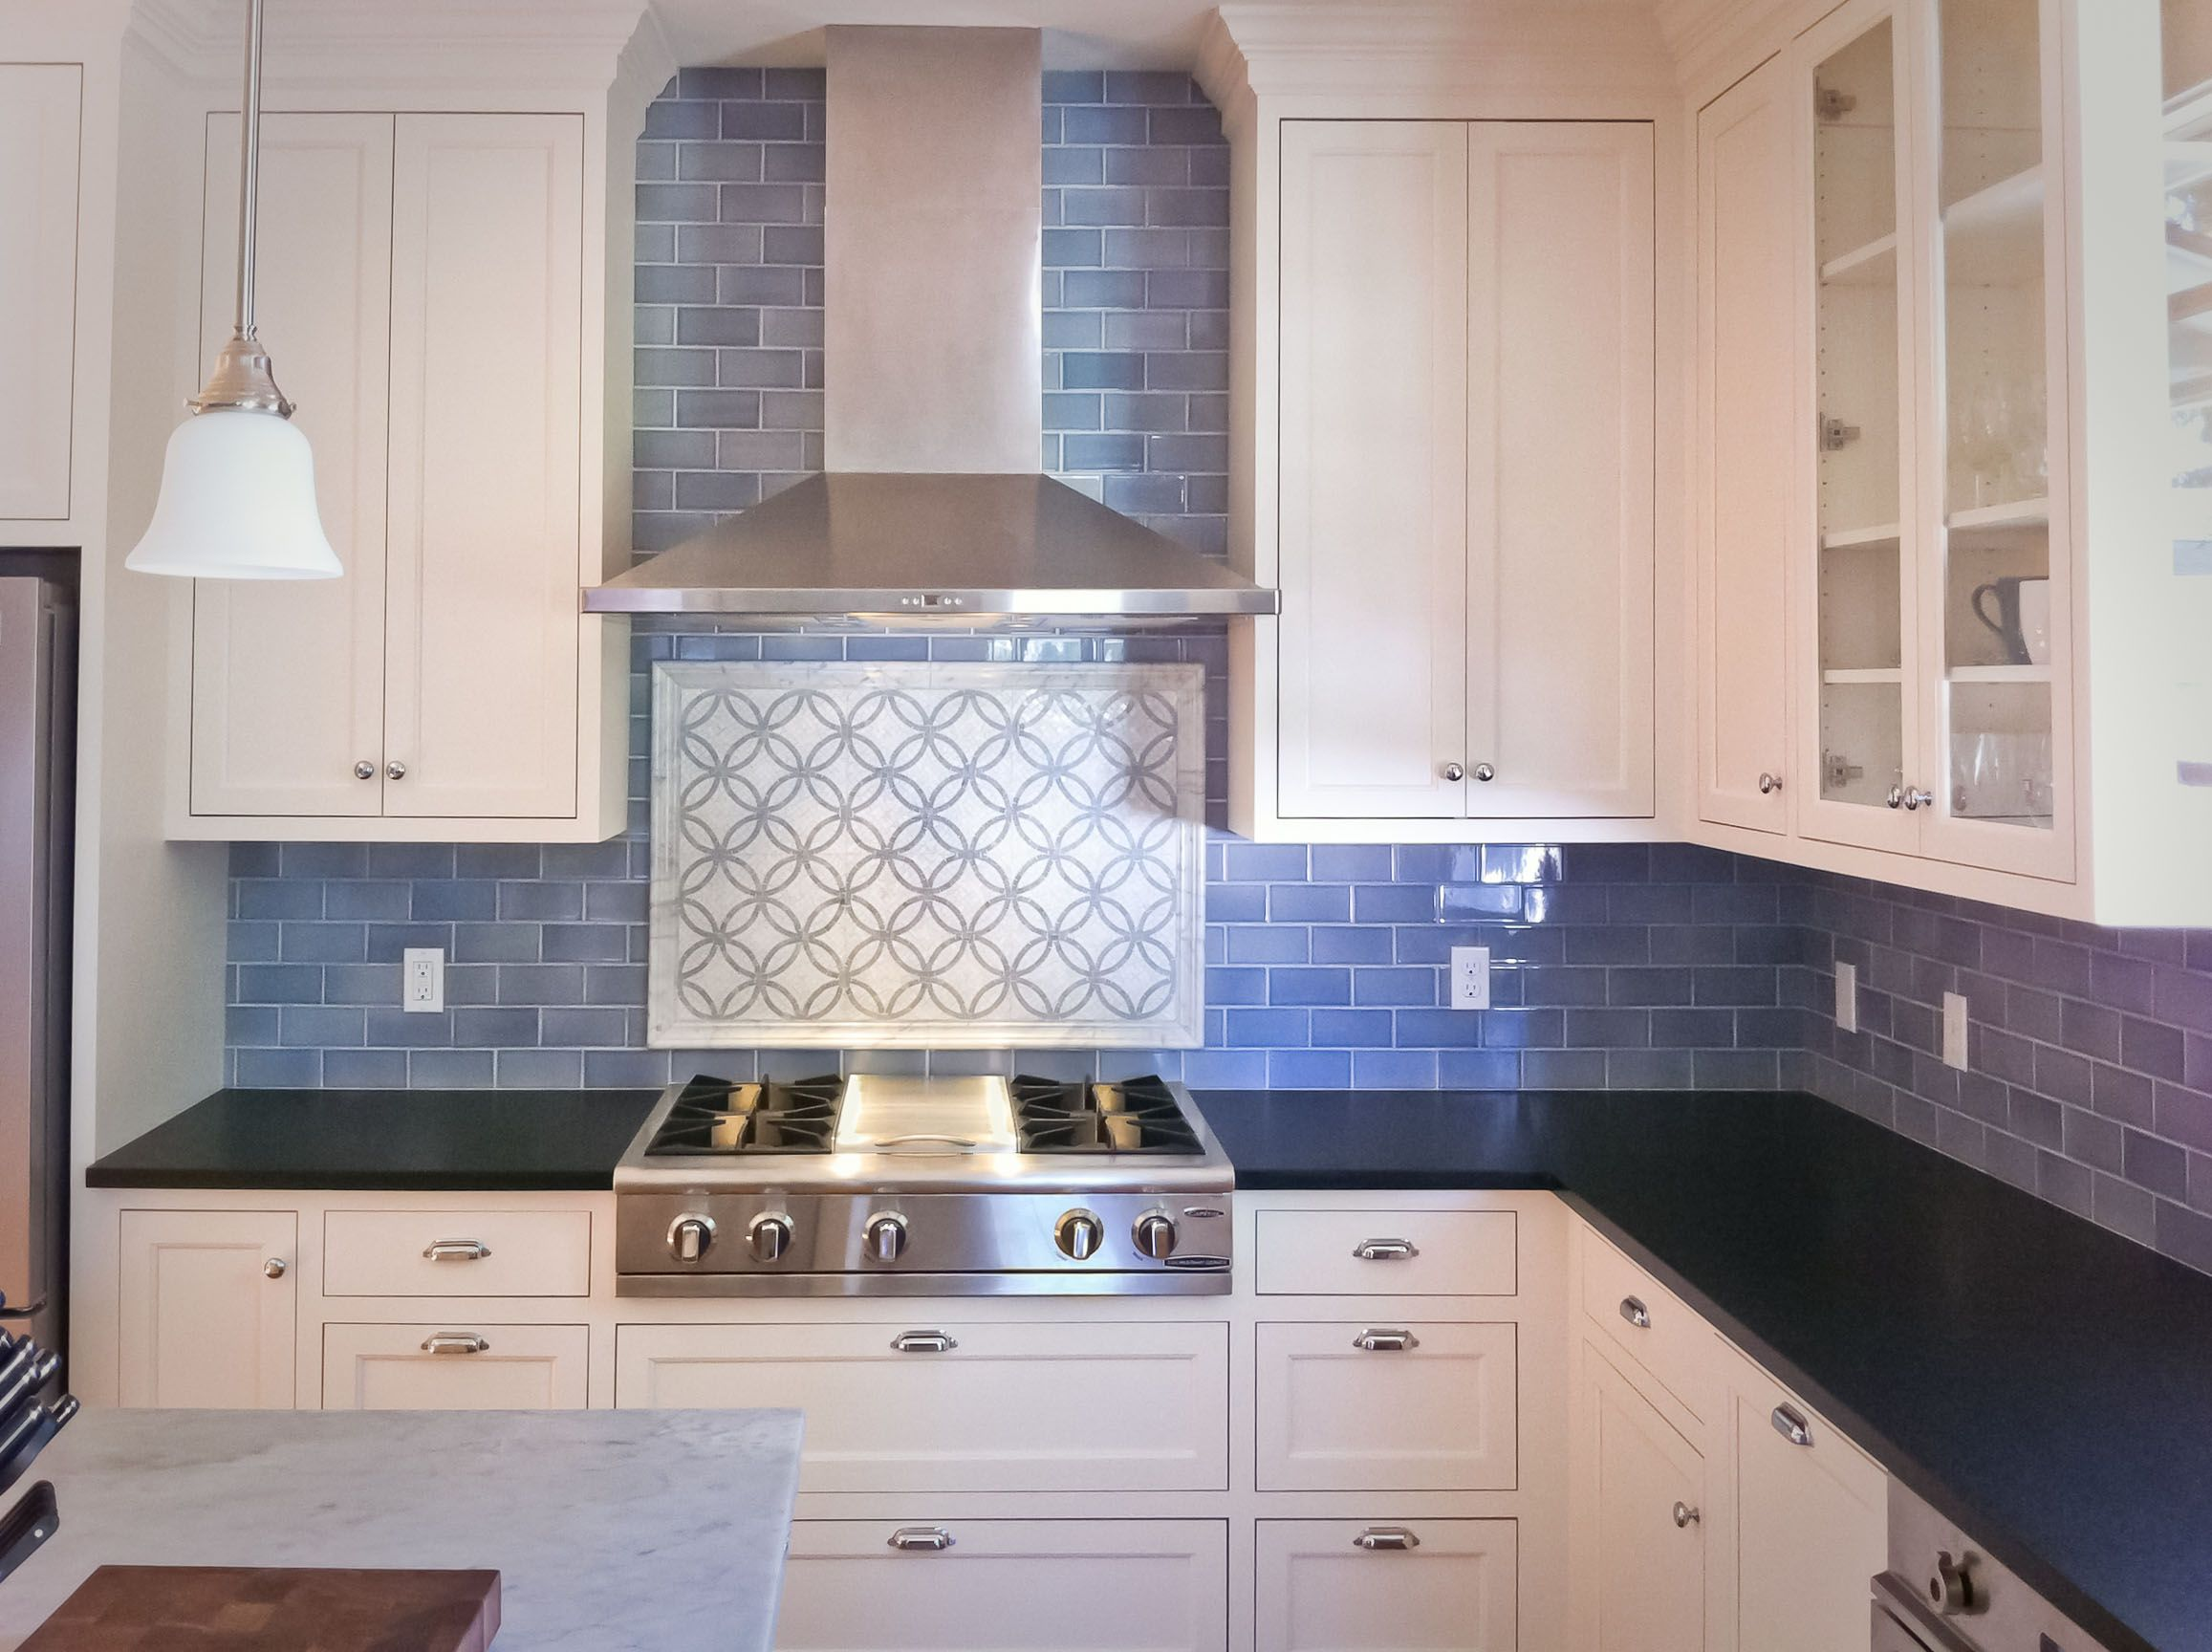 mosaic tile kitchen backsplash backsplash tiles for kitchen Projects Smithcraft Fine Construction